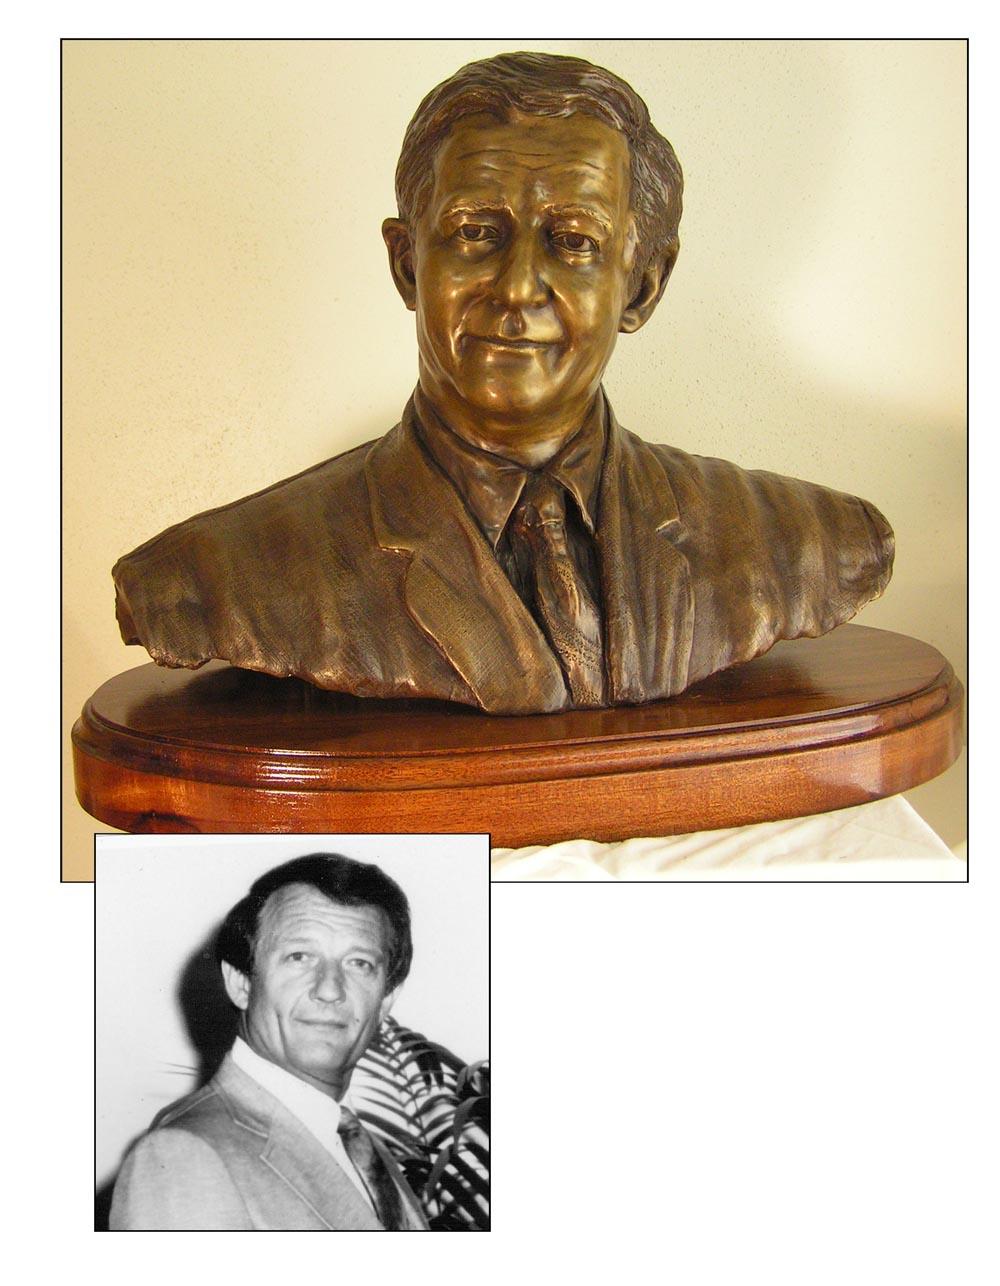 Bronze statue of a man by Texas Sculptor bridgette Mongeon